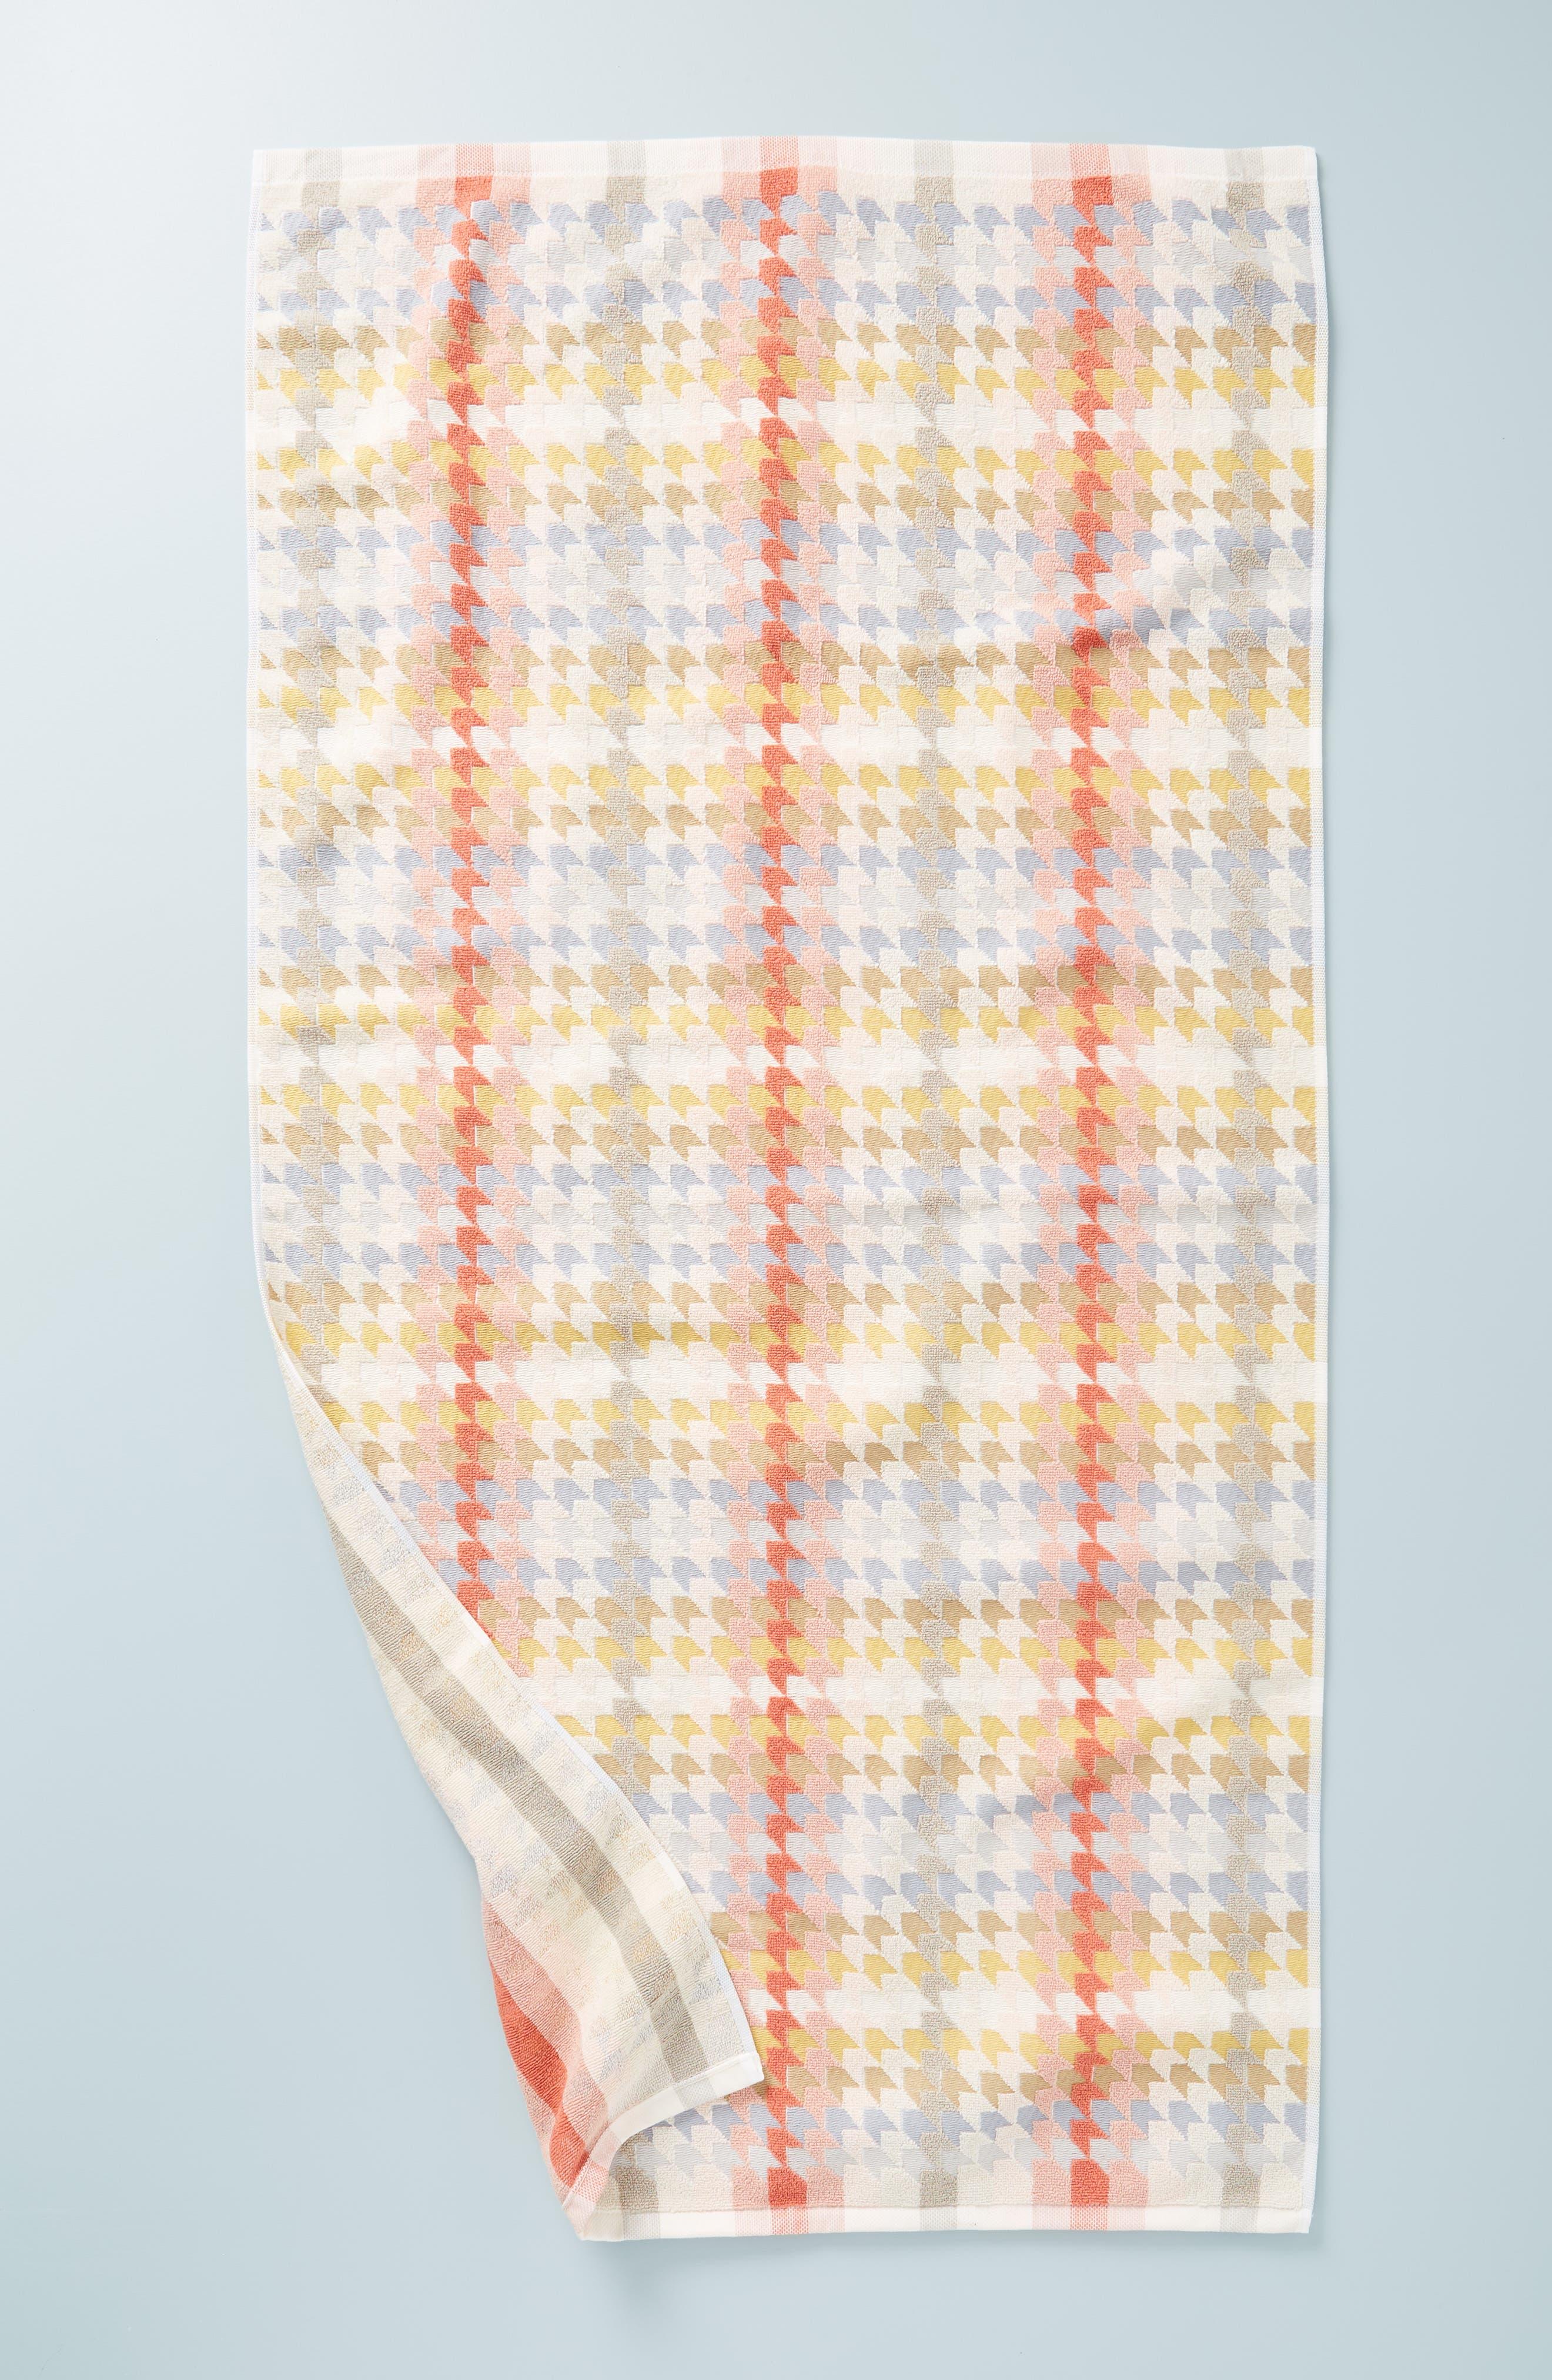 ANTHROPOLOGIE, Noella Bath Towel, Main thumbnail 1, color, ORANGE COMBO